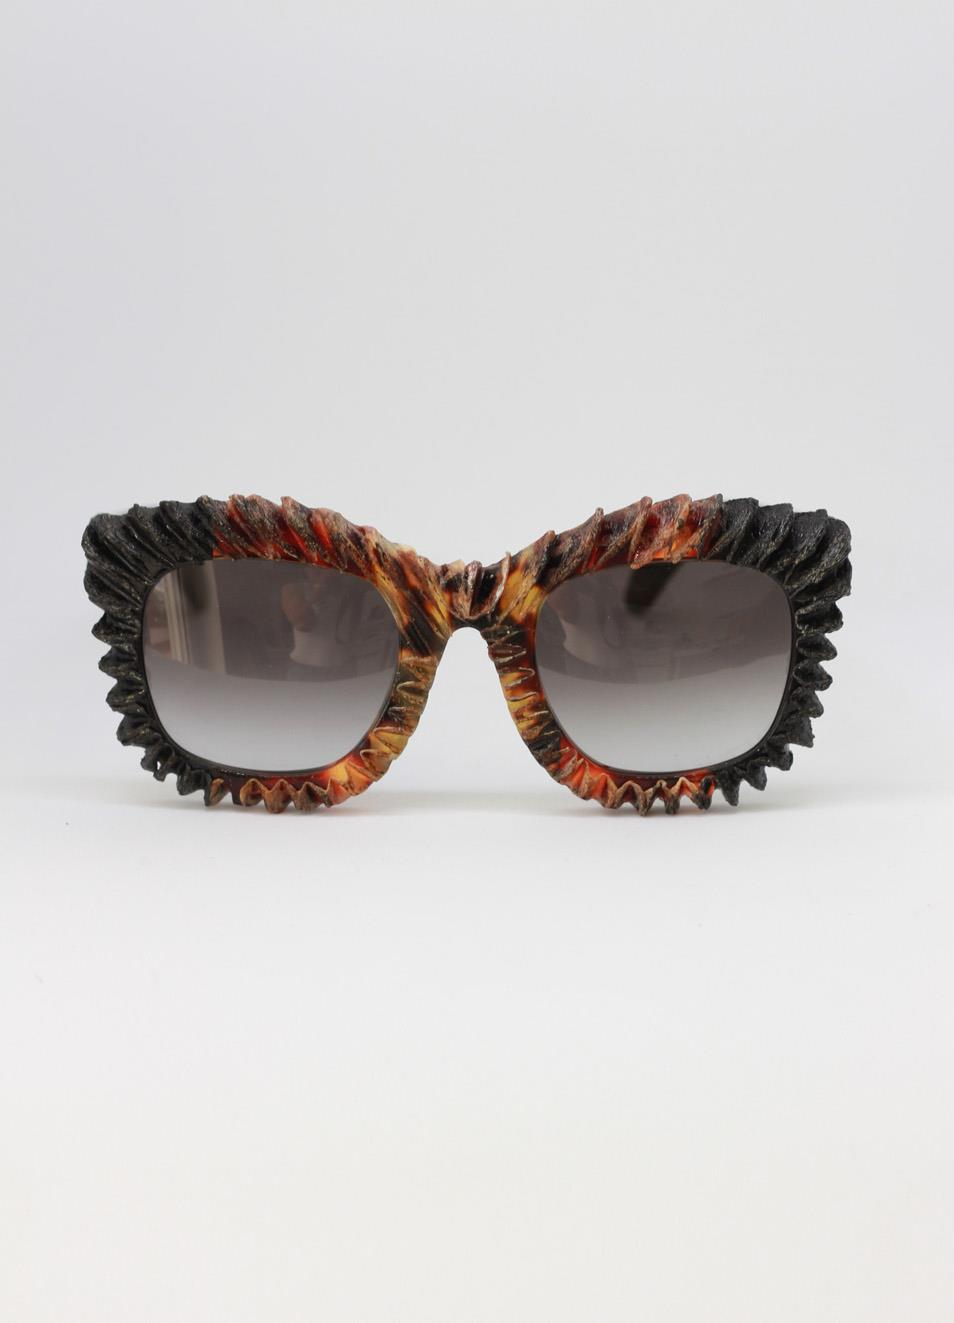 sito affidabile 83f56 98ce2 Kuboraum Sunglasses